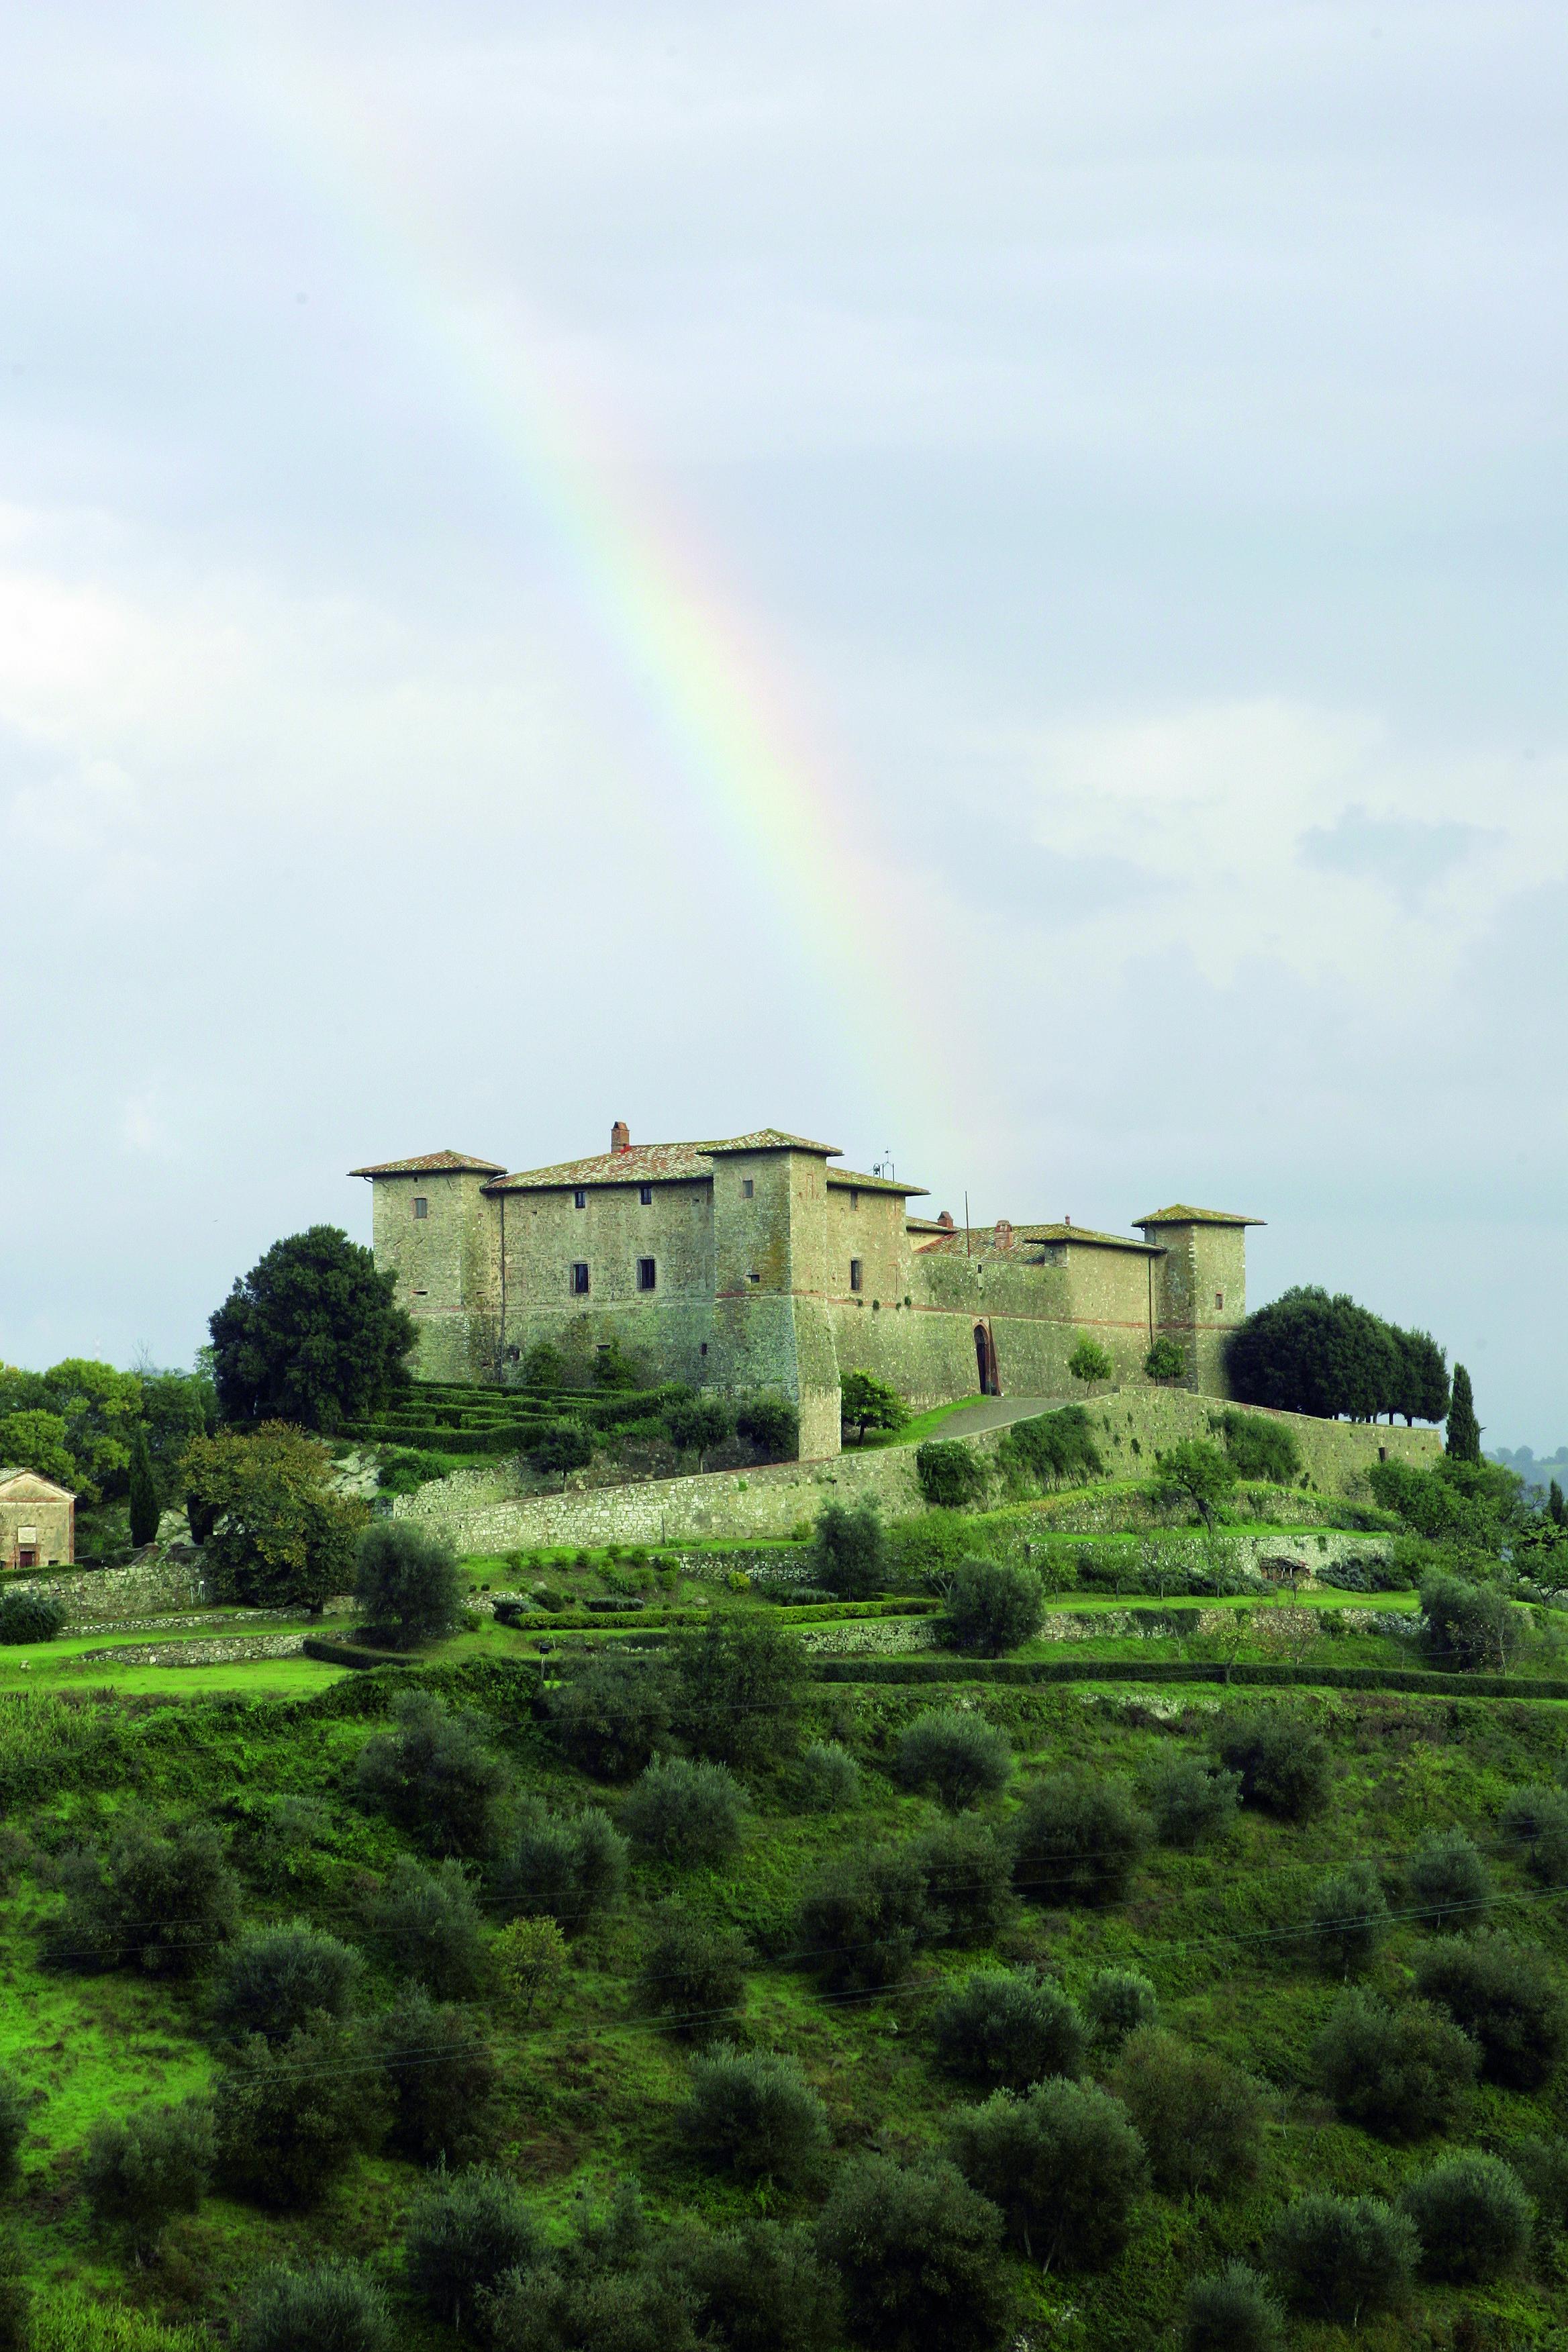 jacopo-biondi-santi-castello-2013